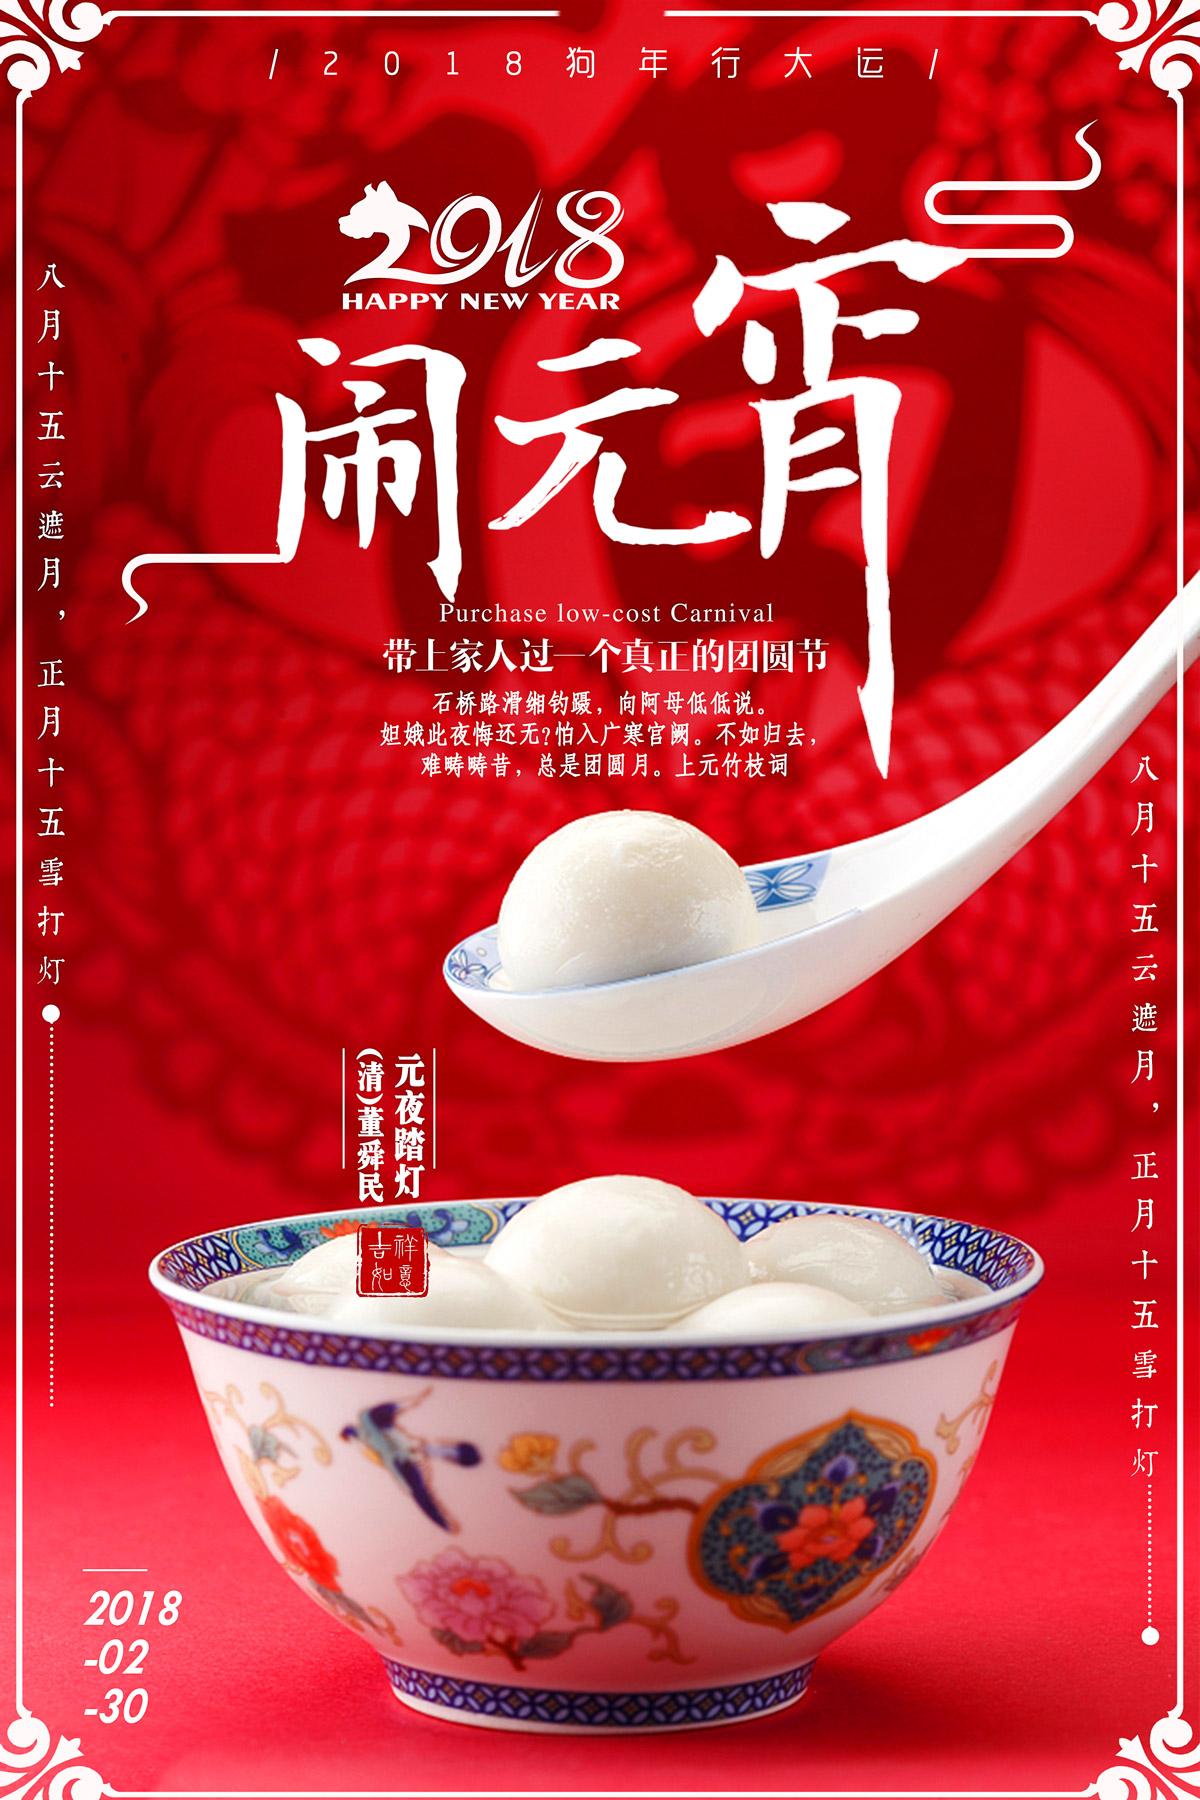 2018 lantern festival poster - China PSD File Free Download